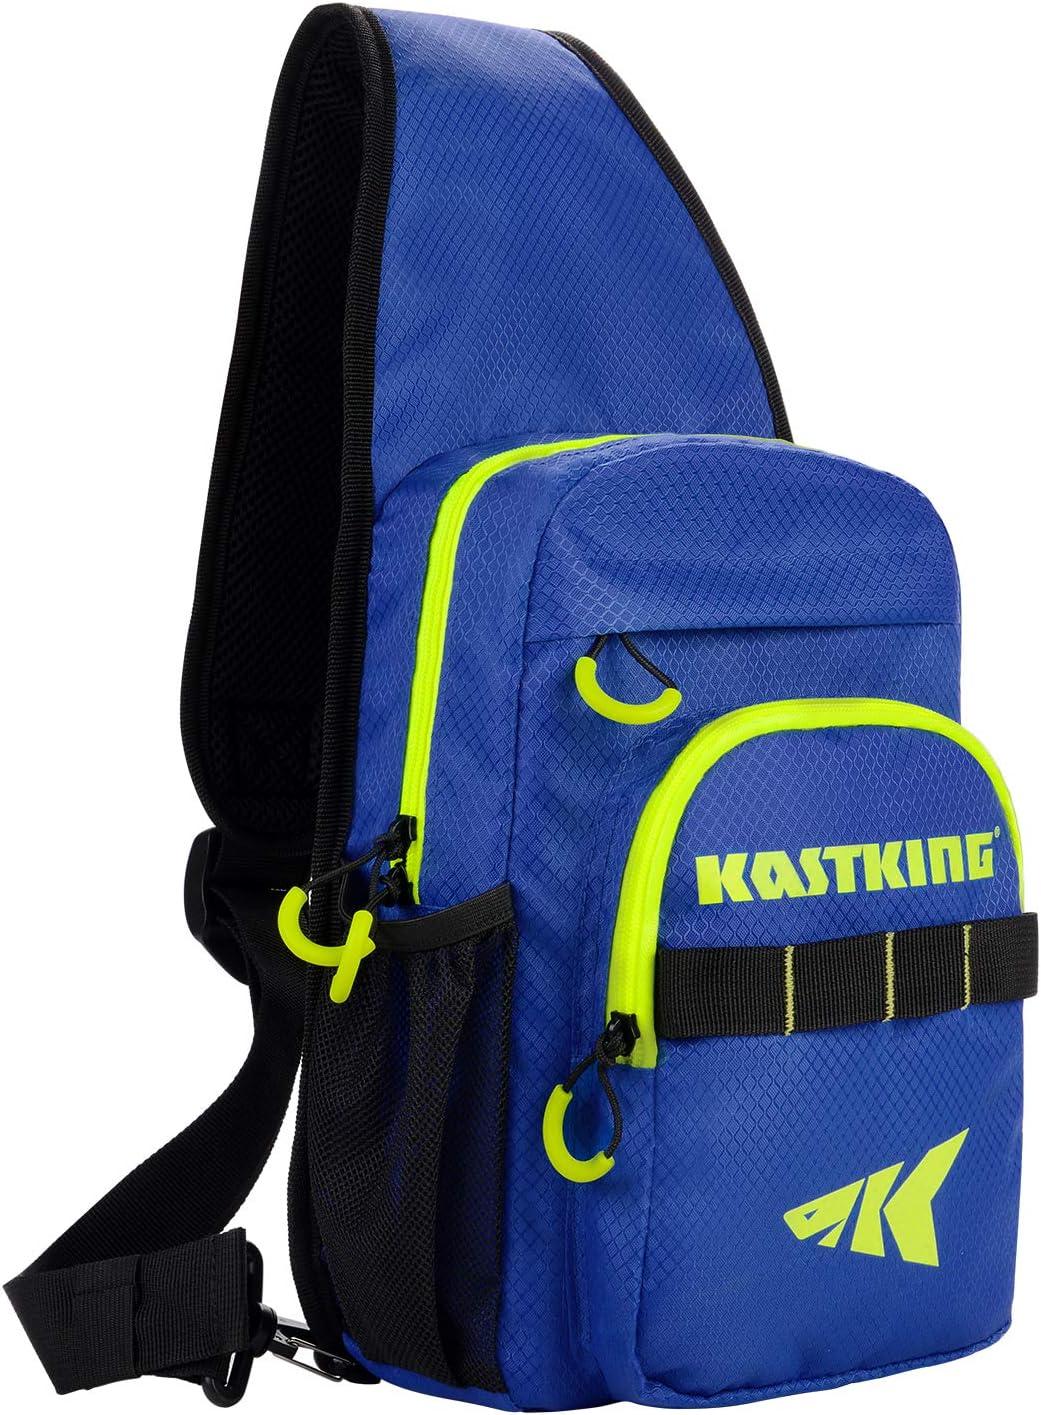 KastKing Sling Fishing Bag Ultra Light-Weight Design Fishing Packs for Fresh or Saltwater Fishing Sling Tool Bag for Hiking, Biking, Hunting, Camping or School